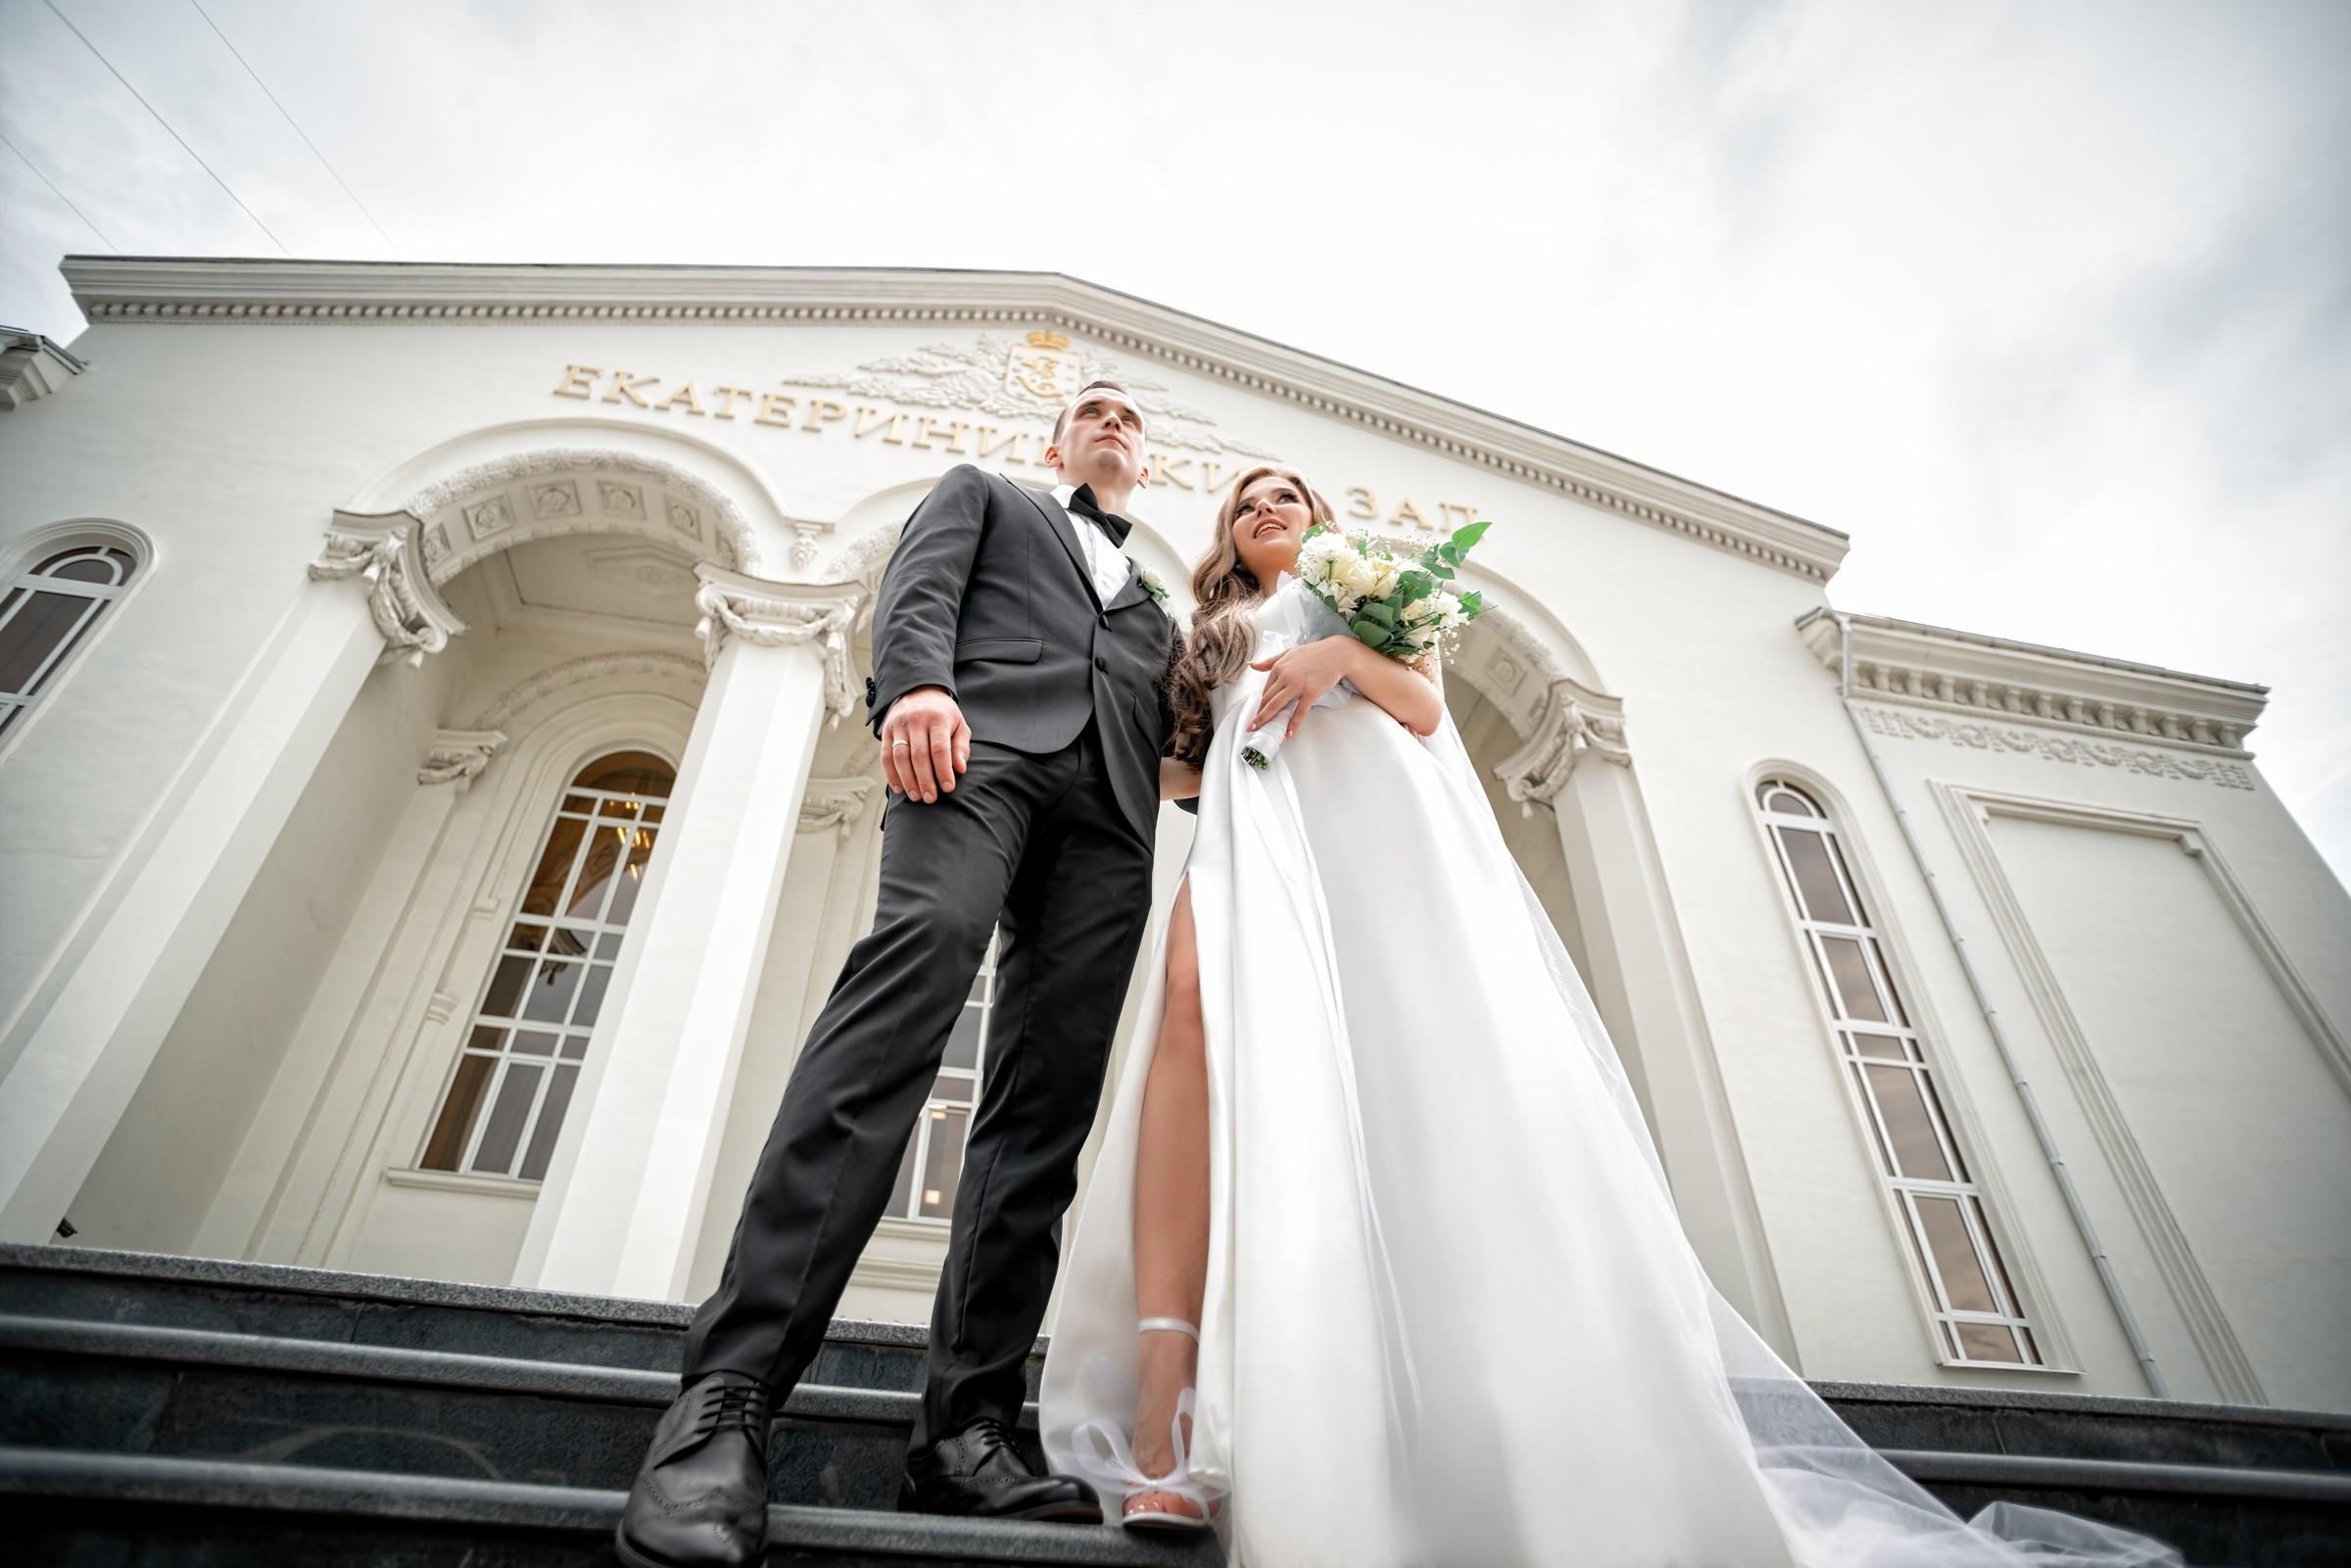 Свадебная фотосъемка в ЗАГСе Екатерининский Зал Краснодар от свадебного фотографа. Фасад ЗАГСа